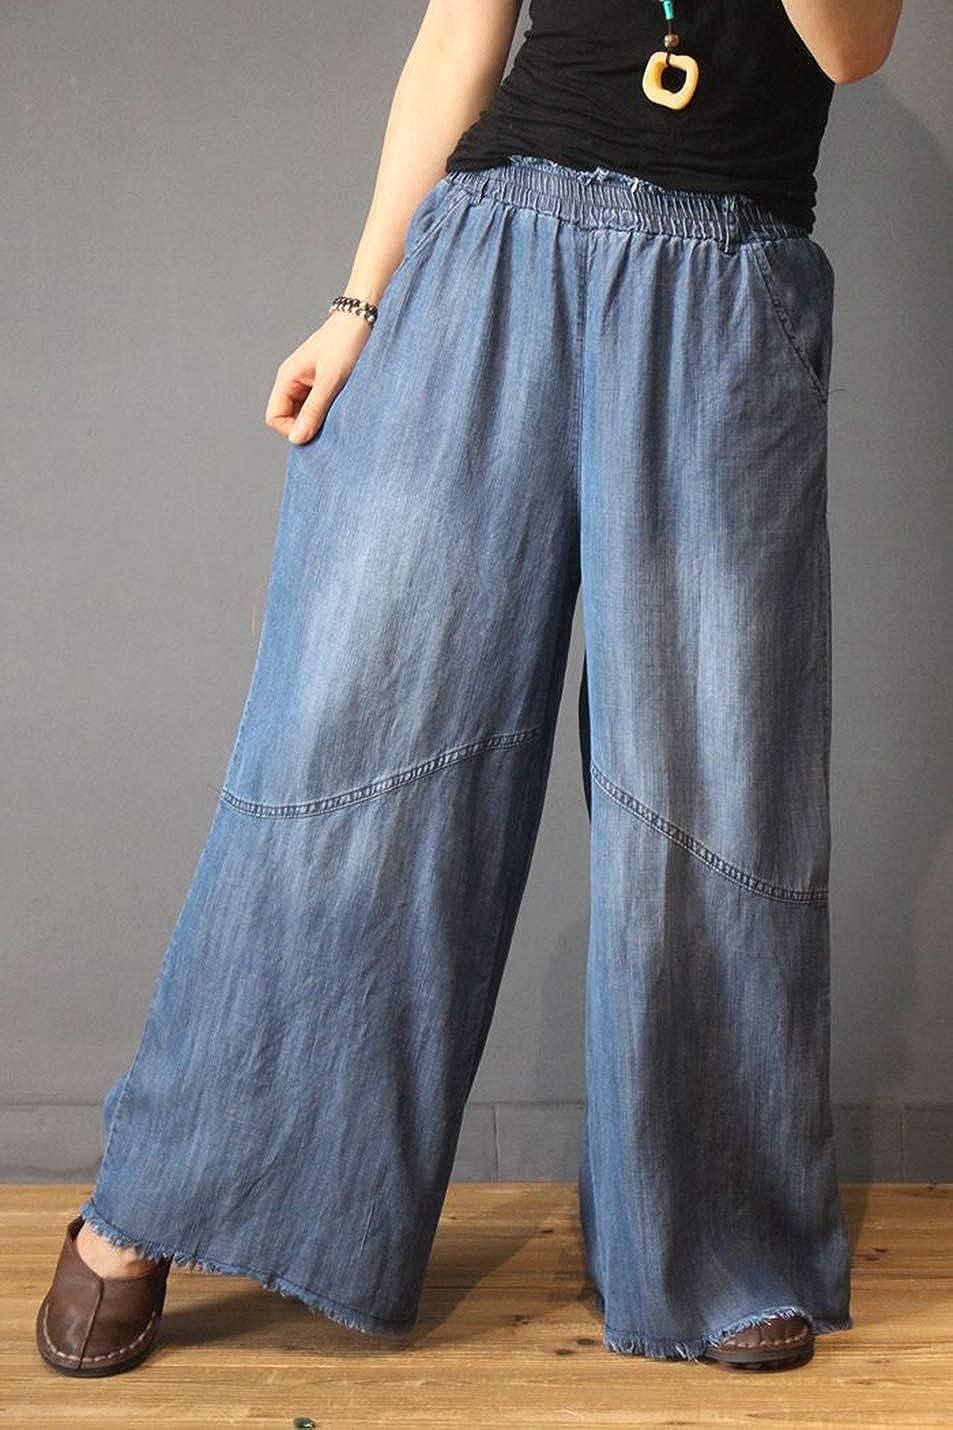 Yimoon Womens Elastic Waist Denim Wide Leg Pants Loose Jeans Low Crotch Herem Pants